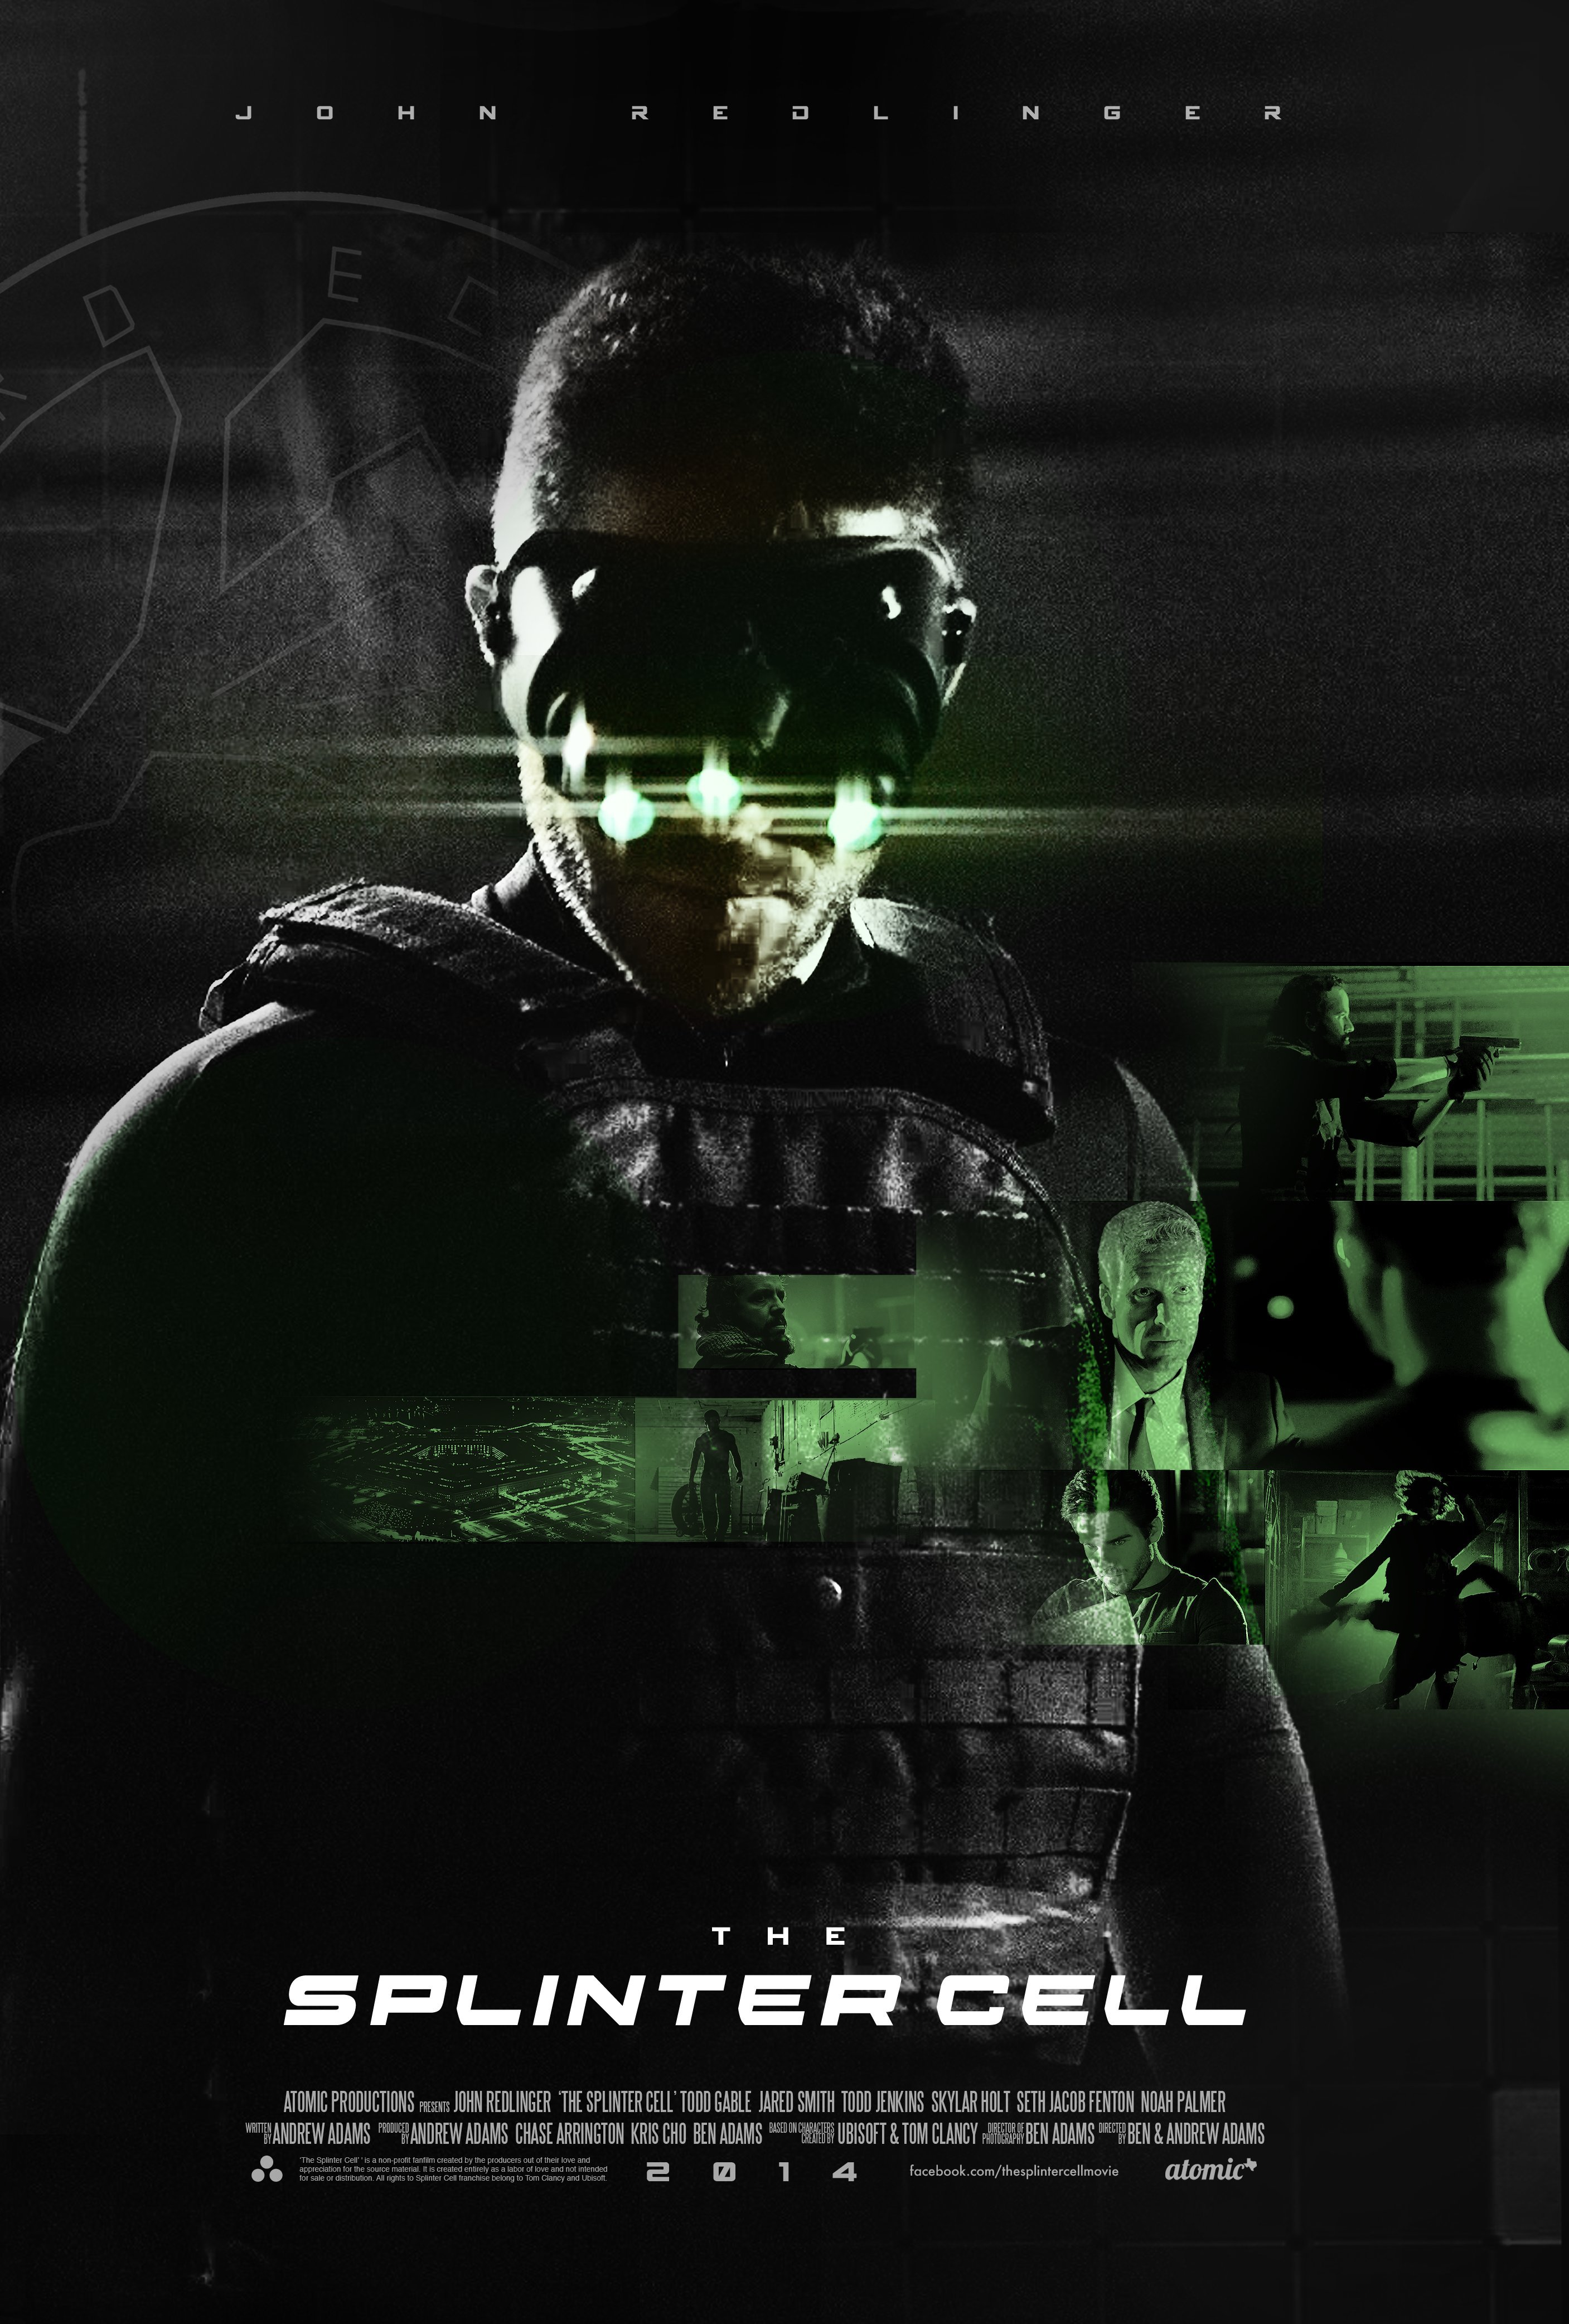 Download Filme Splinter Cell Torrent 2022 Qualidade Hd